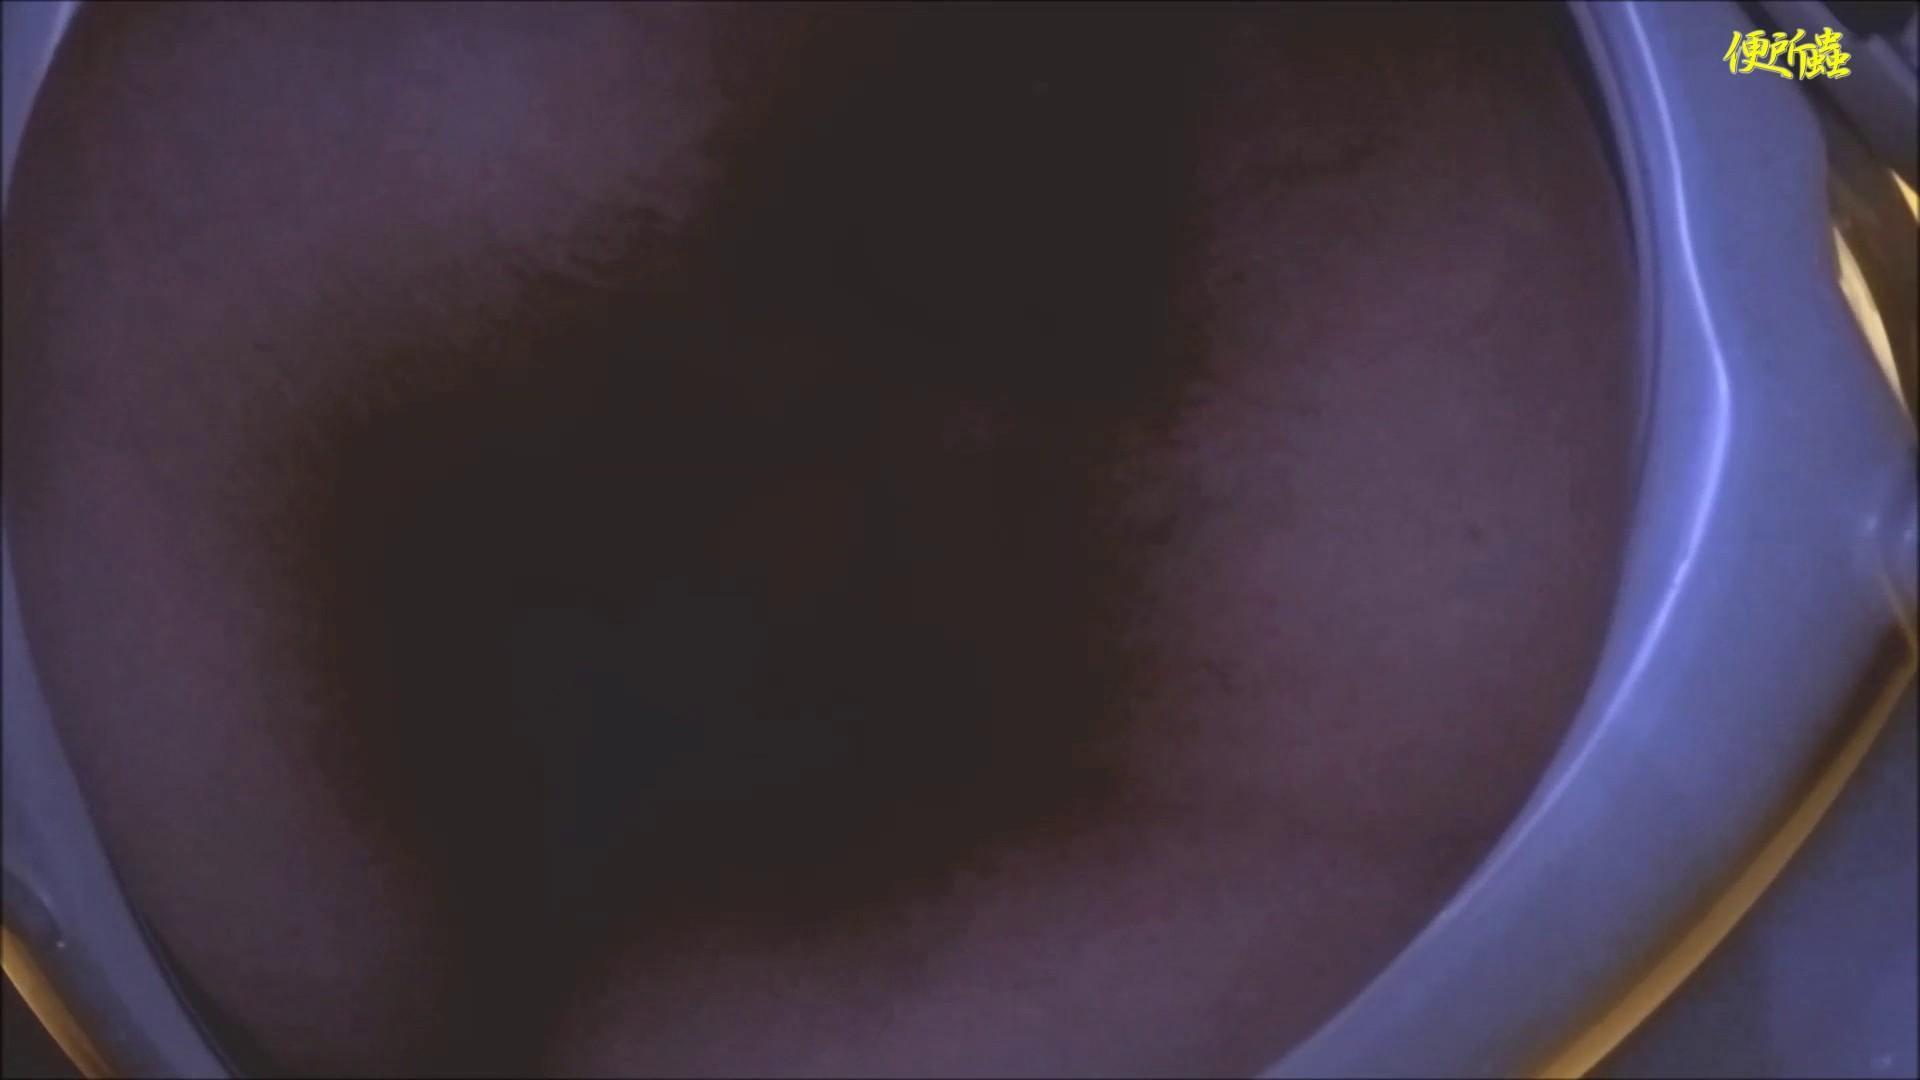 vol.07 便所蟲さんのリターン~寺子屋洗面所盗撮~※画質改善※総勢7名 便器   丸見え  79画像 37